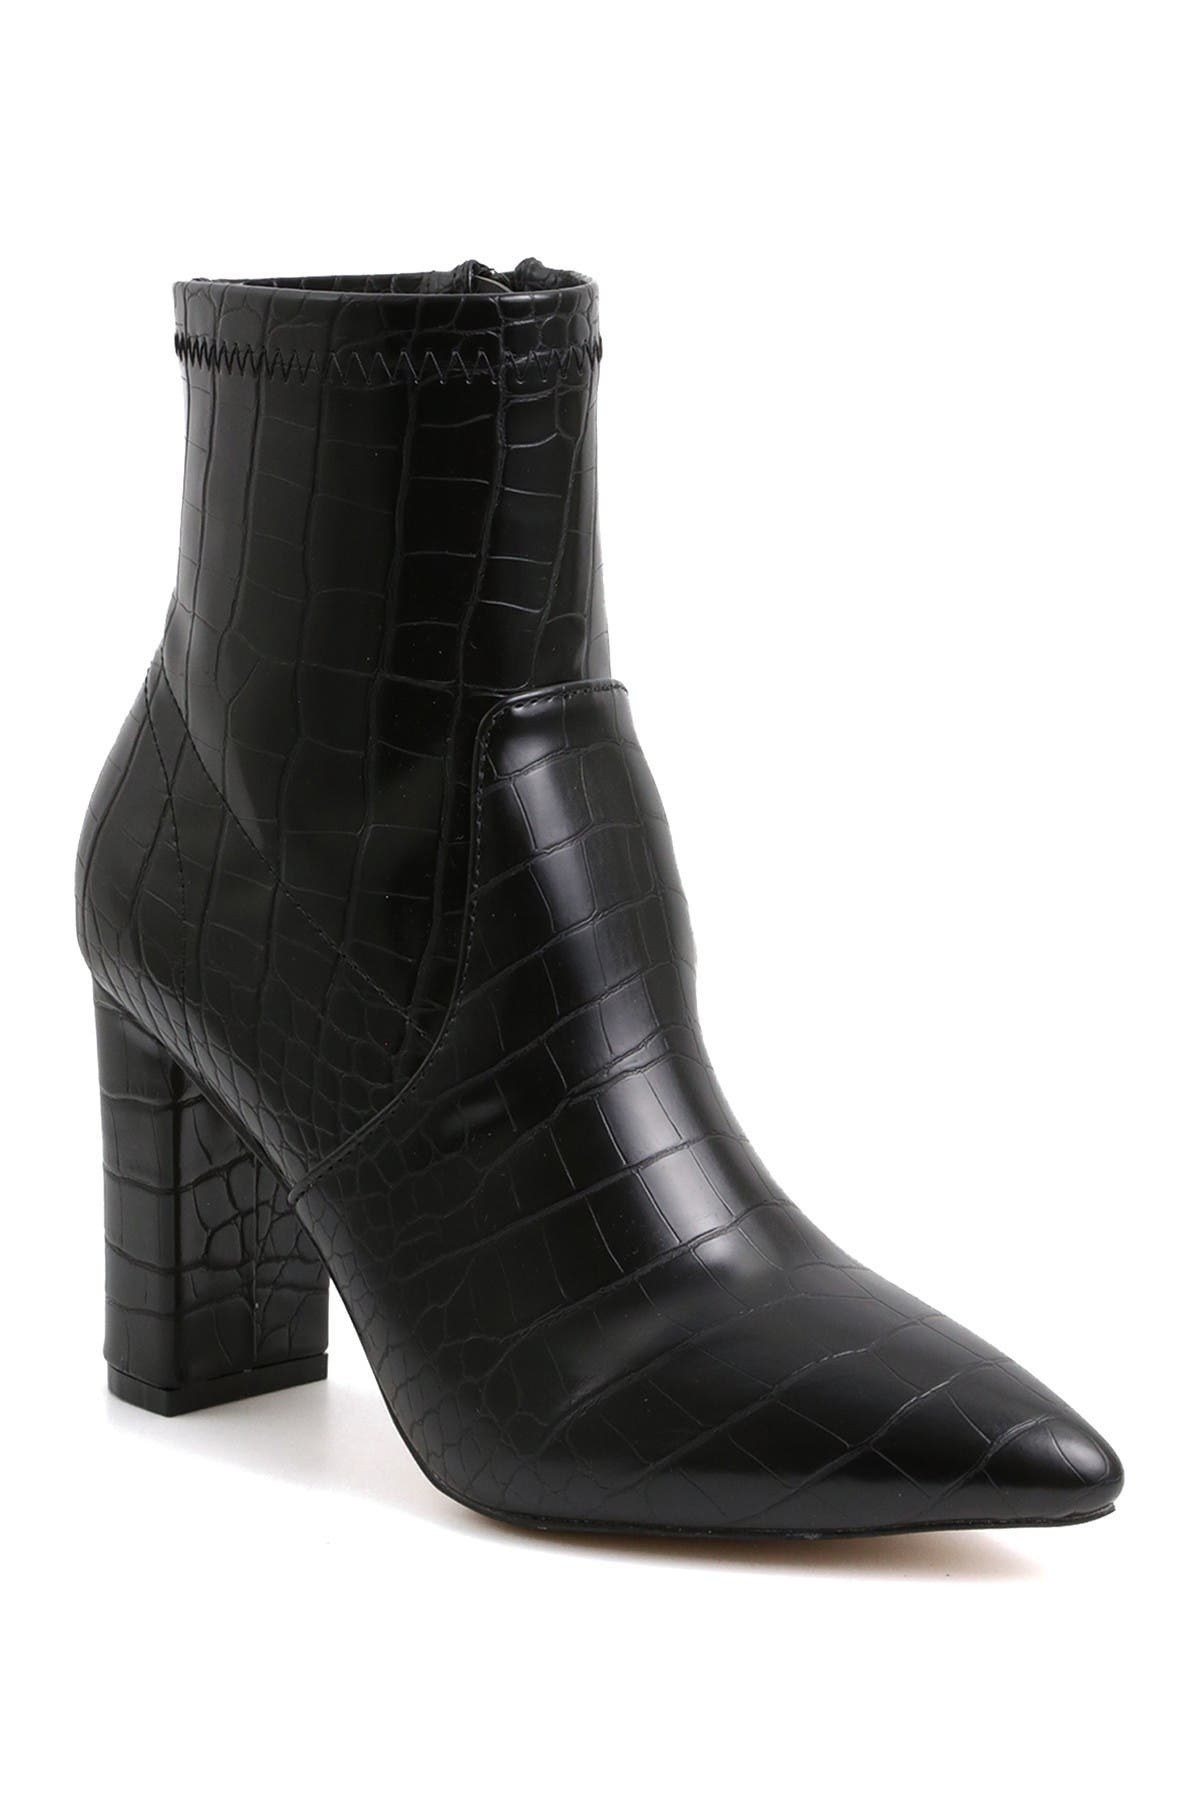 Image of Catherine Catherine Malandrino Bolonie Vegan Leather Pointed Toe Block Heel Bootie